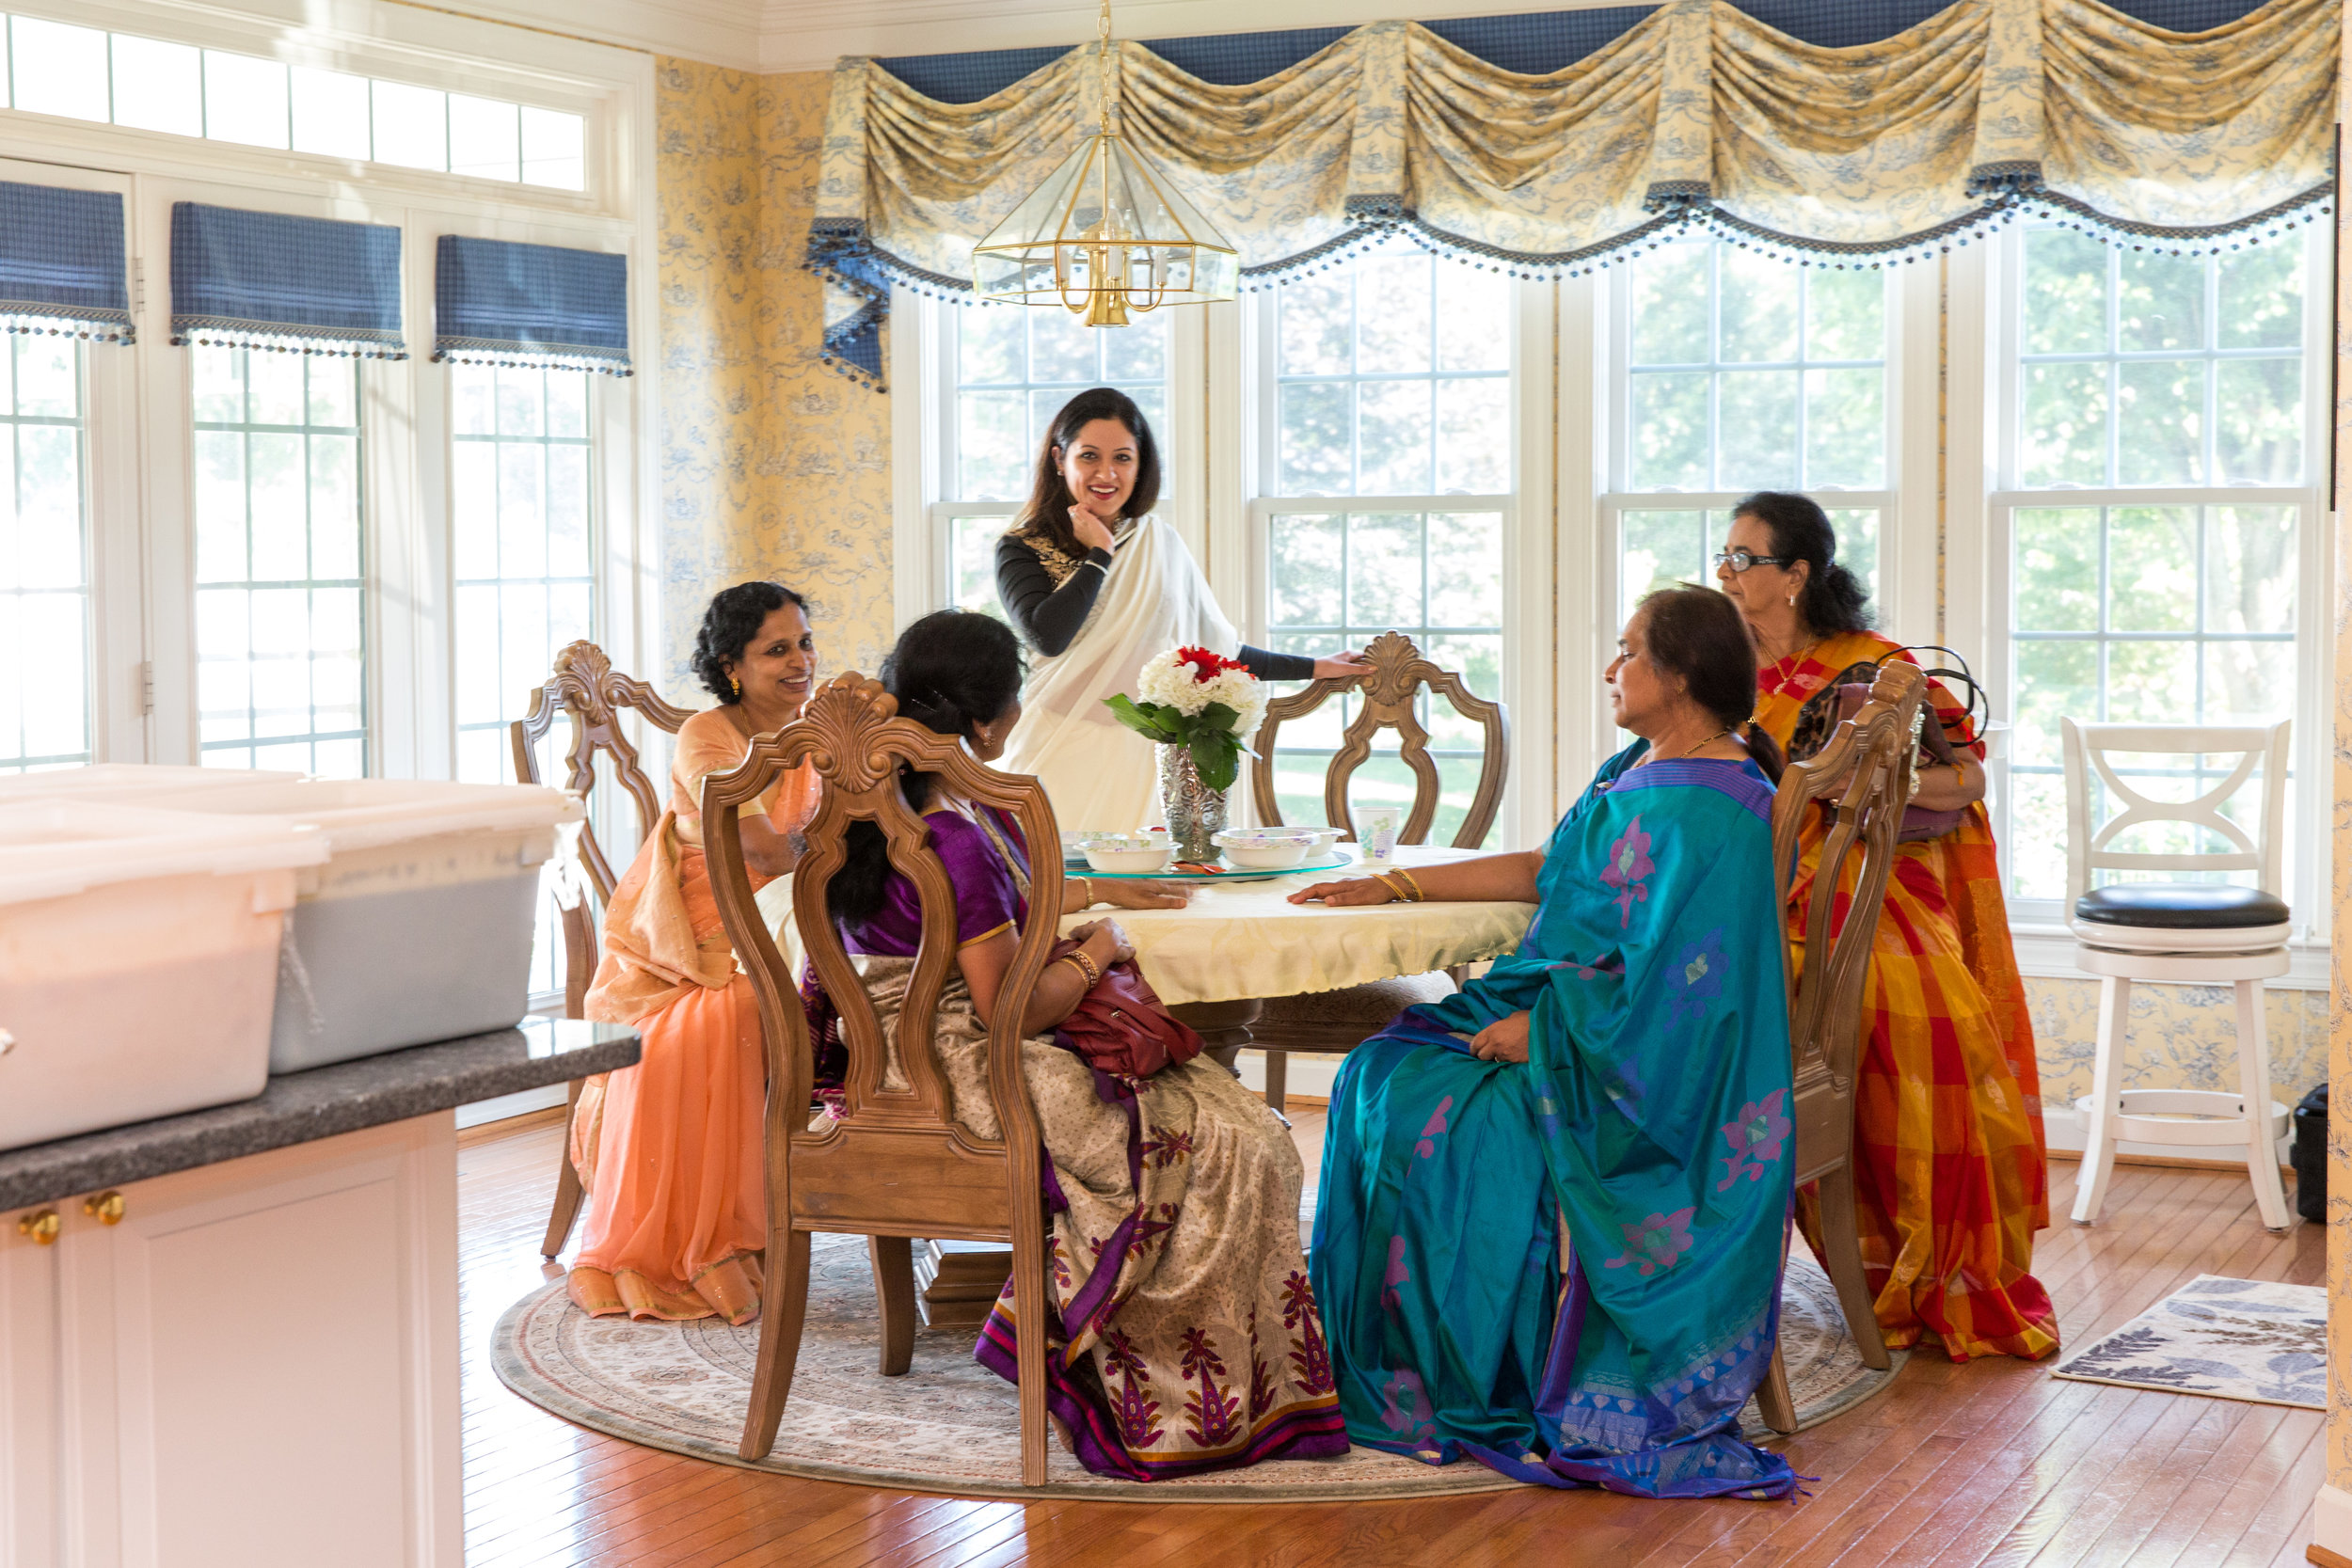 Women sitting around table